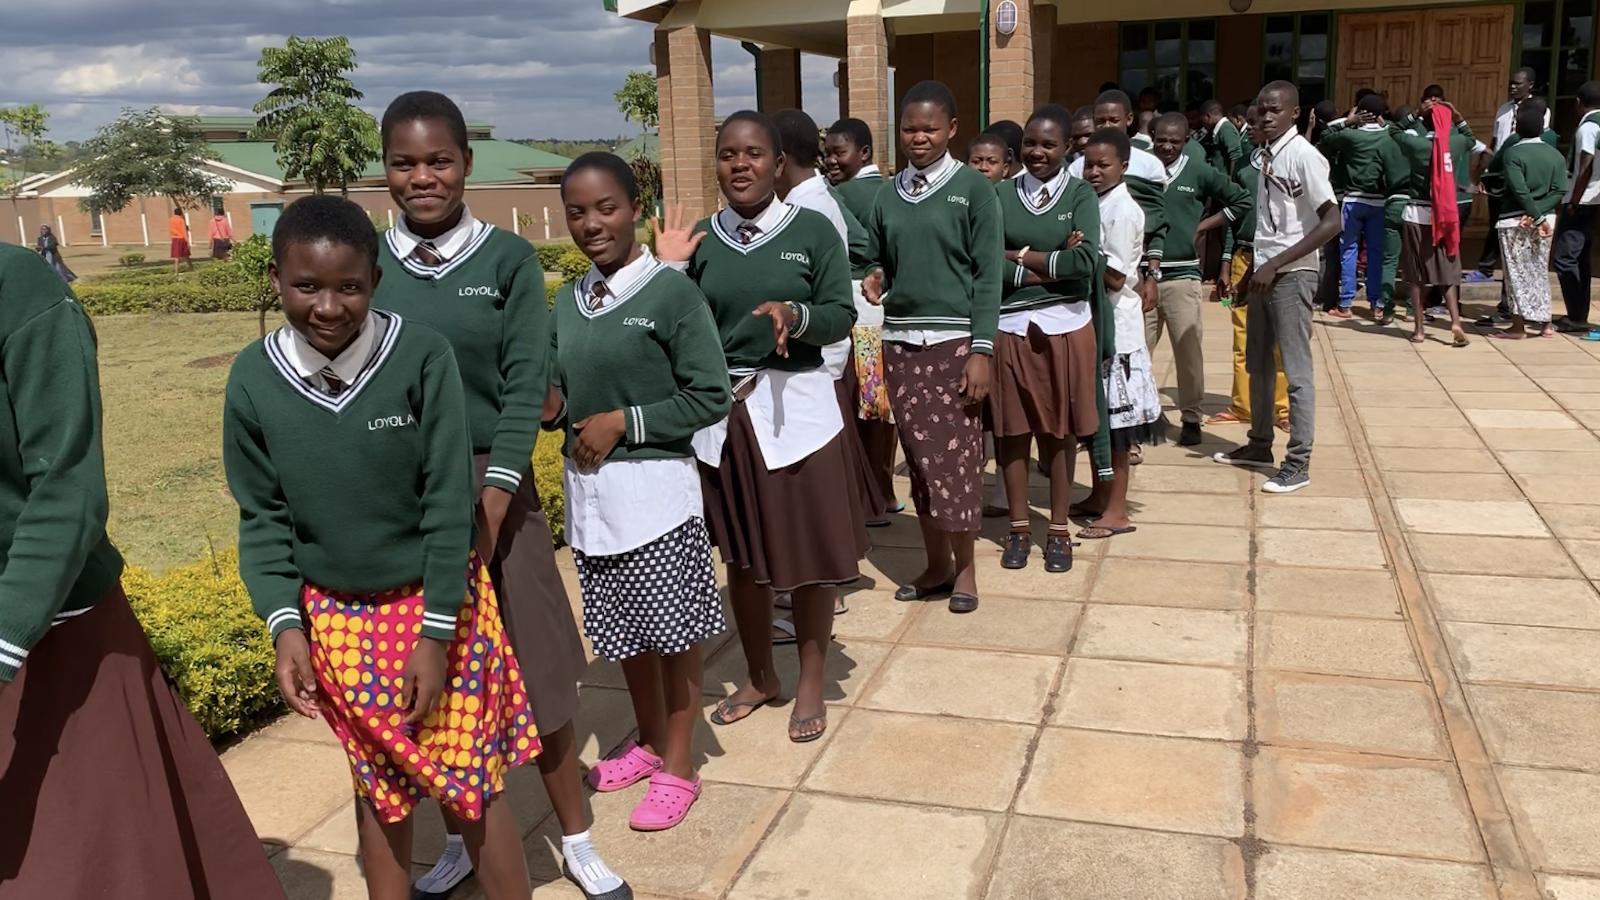 Children line up in Malawi